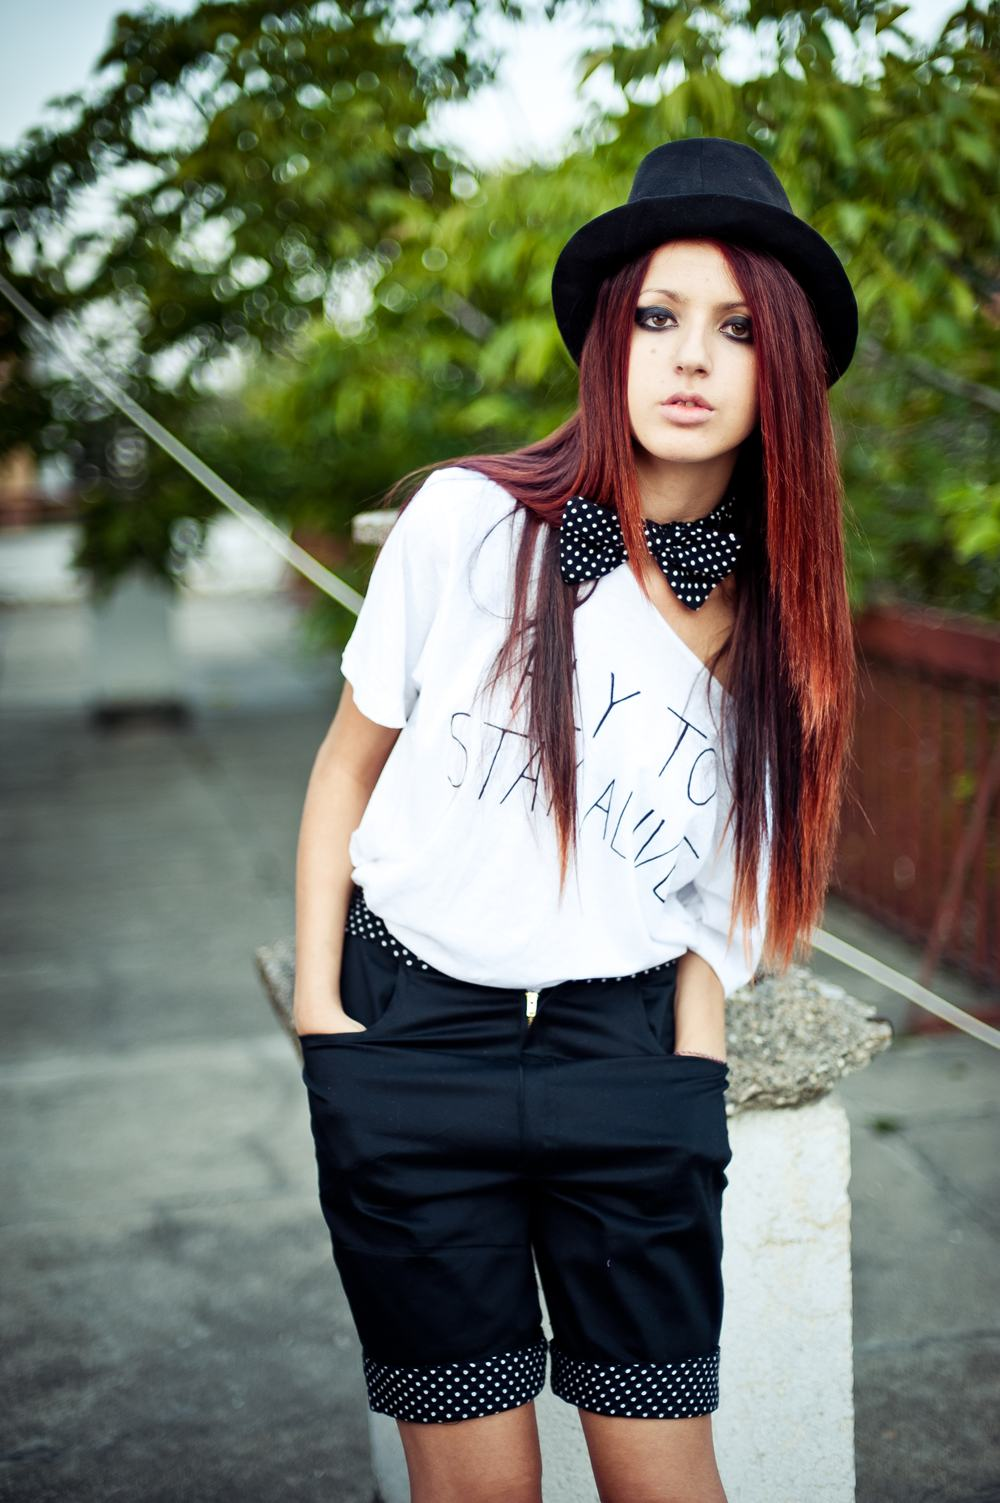 Jelena Nik